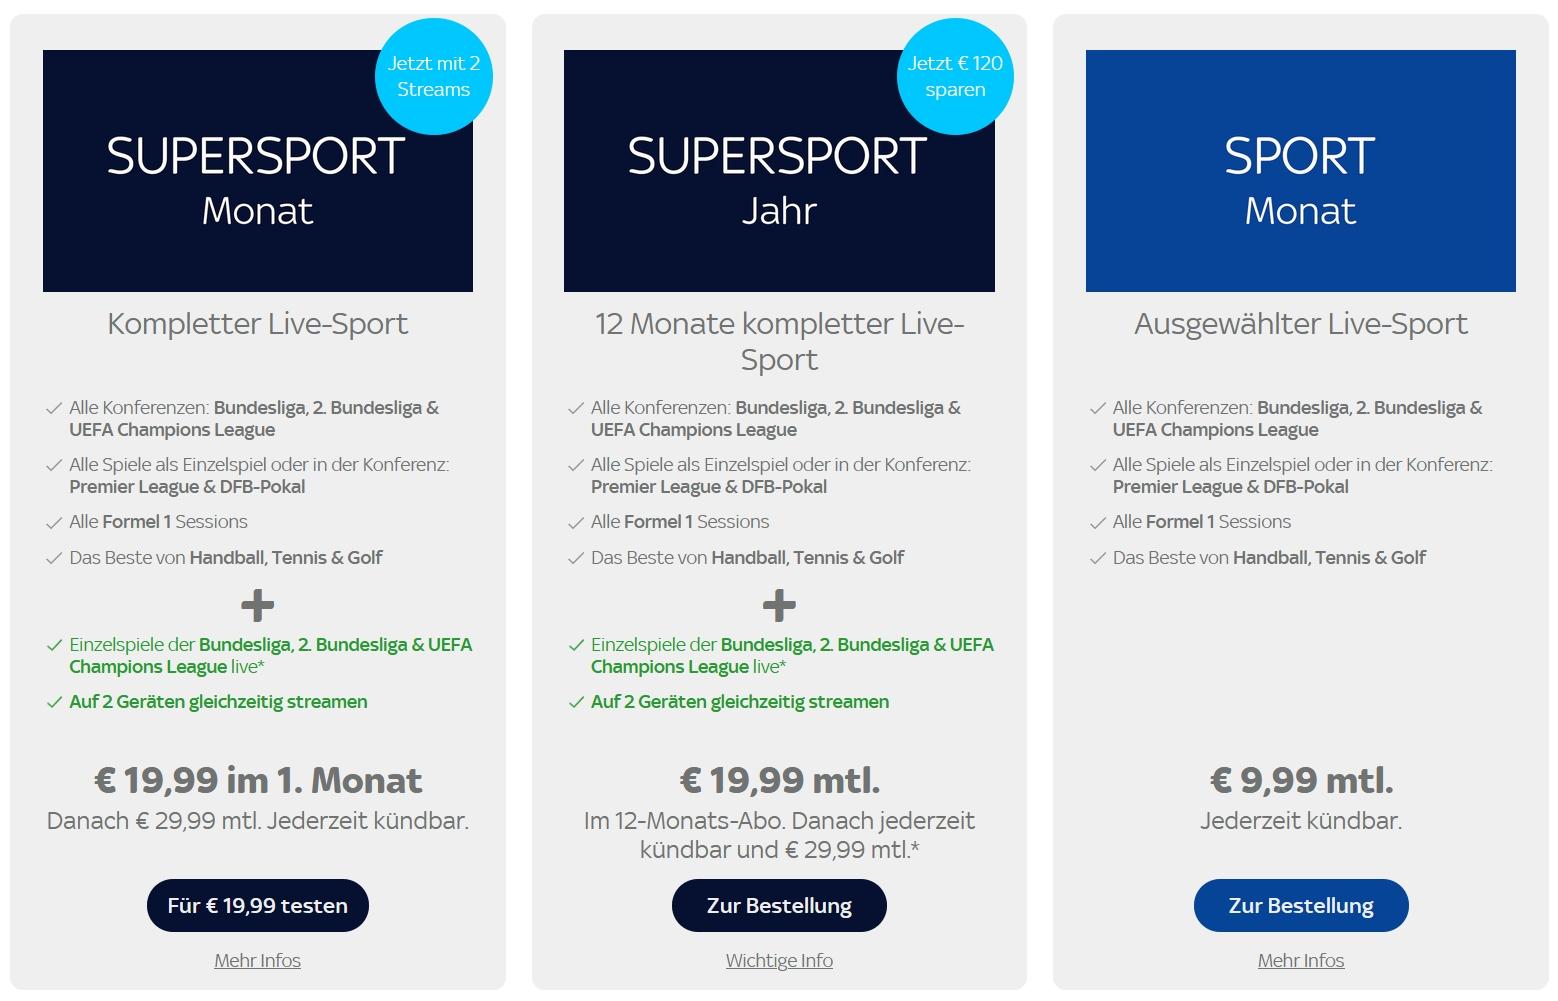 sky-ticket-supersport-angebote-aktuell